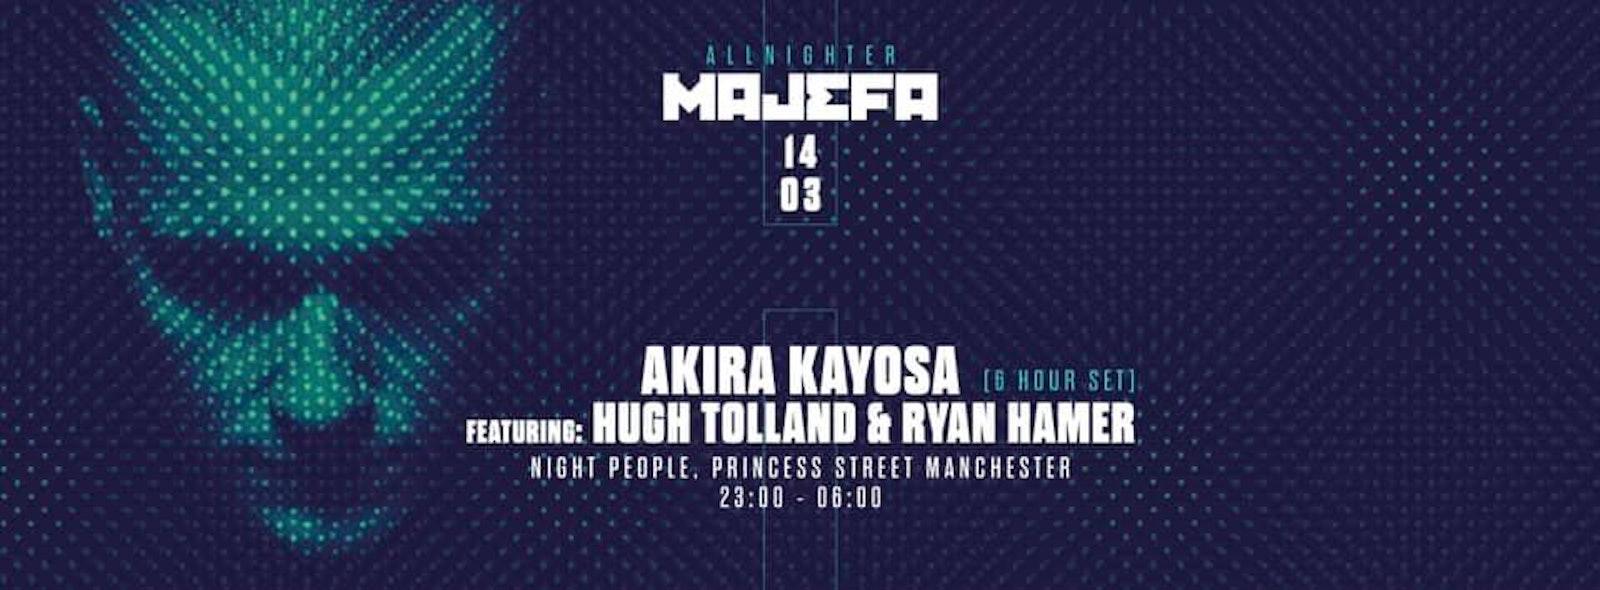 Majefa All Nighter: Akira Kayosa 6 Hour Set